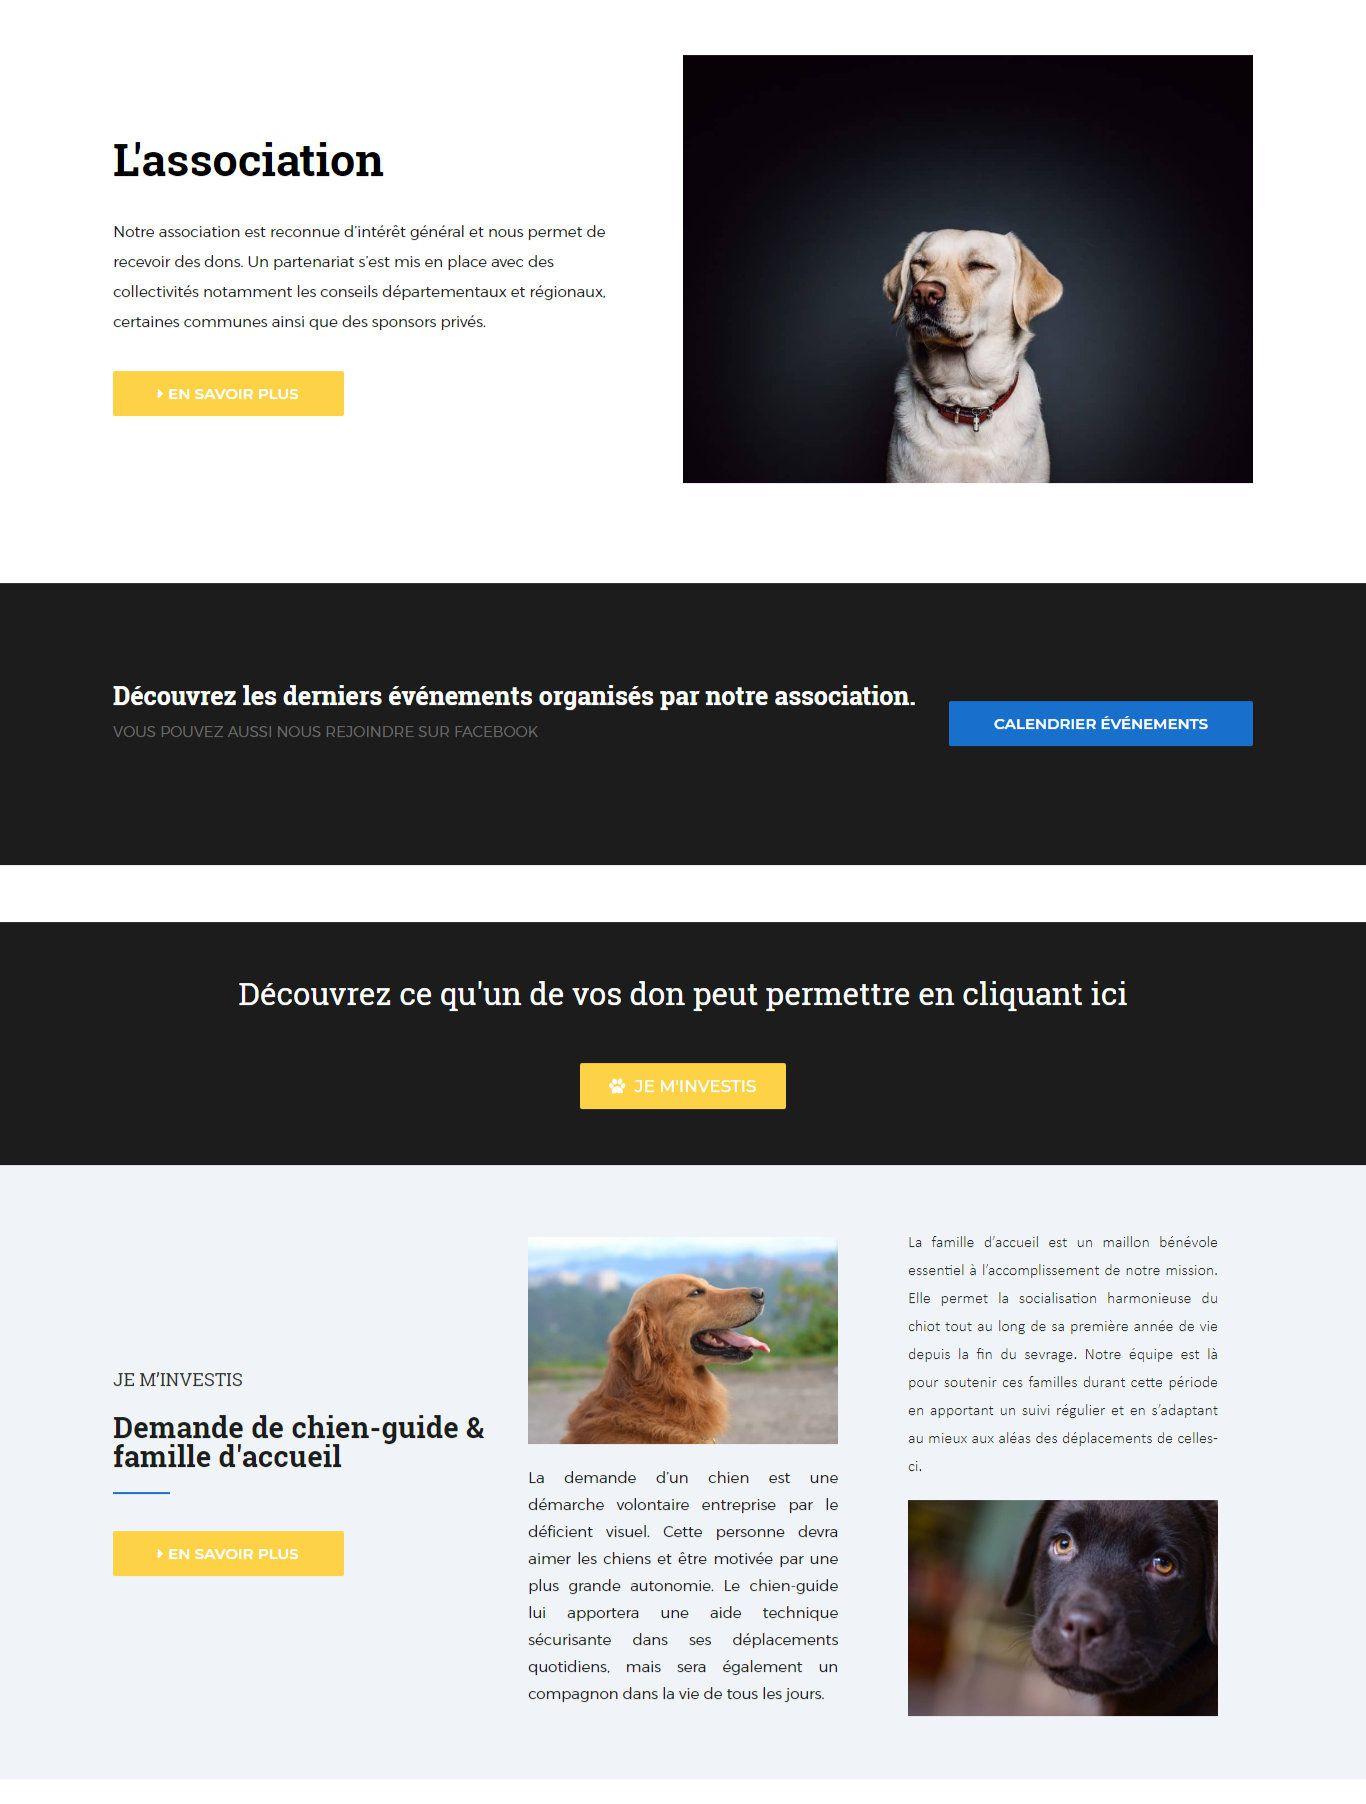 03_emcga_présentation_création_site_internet_albi_light